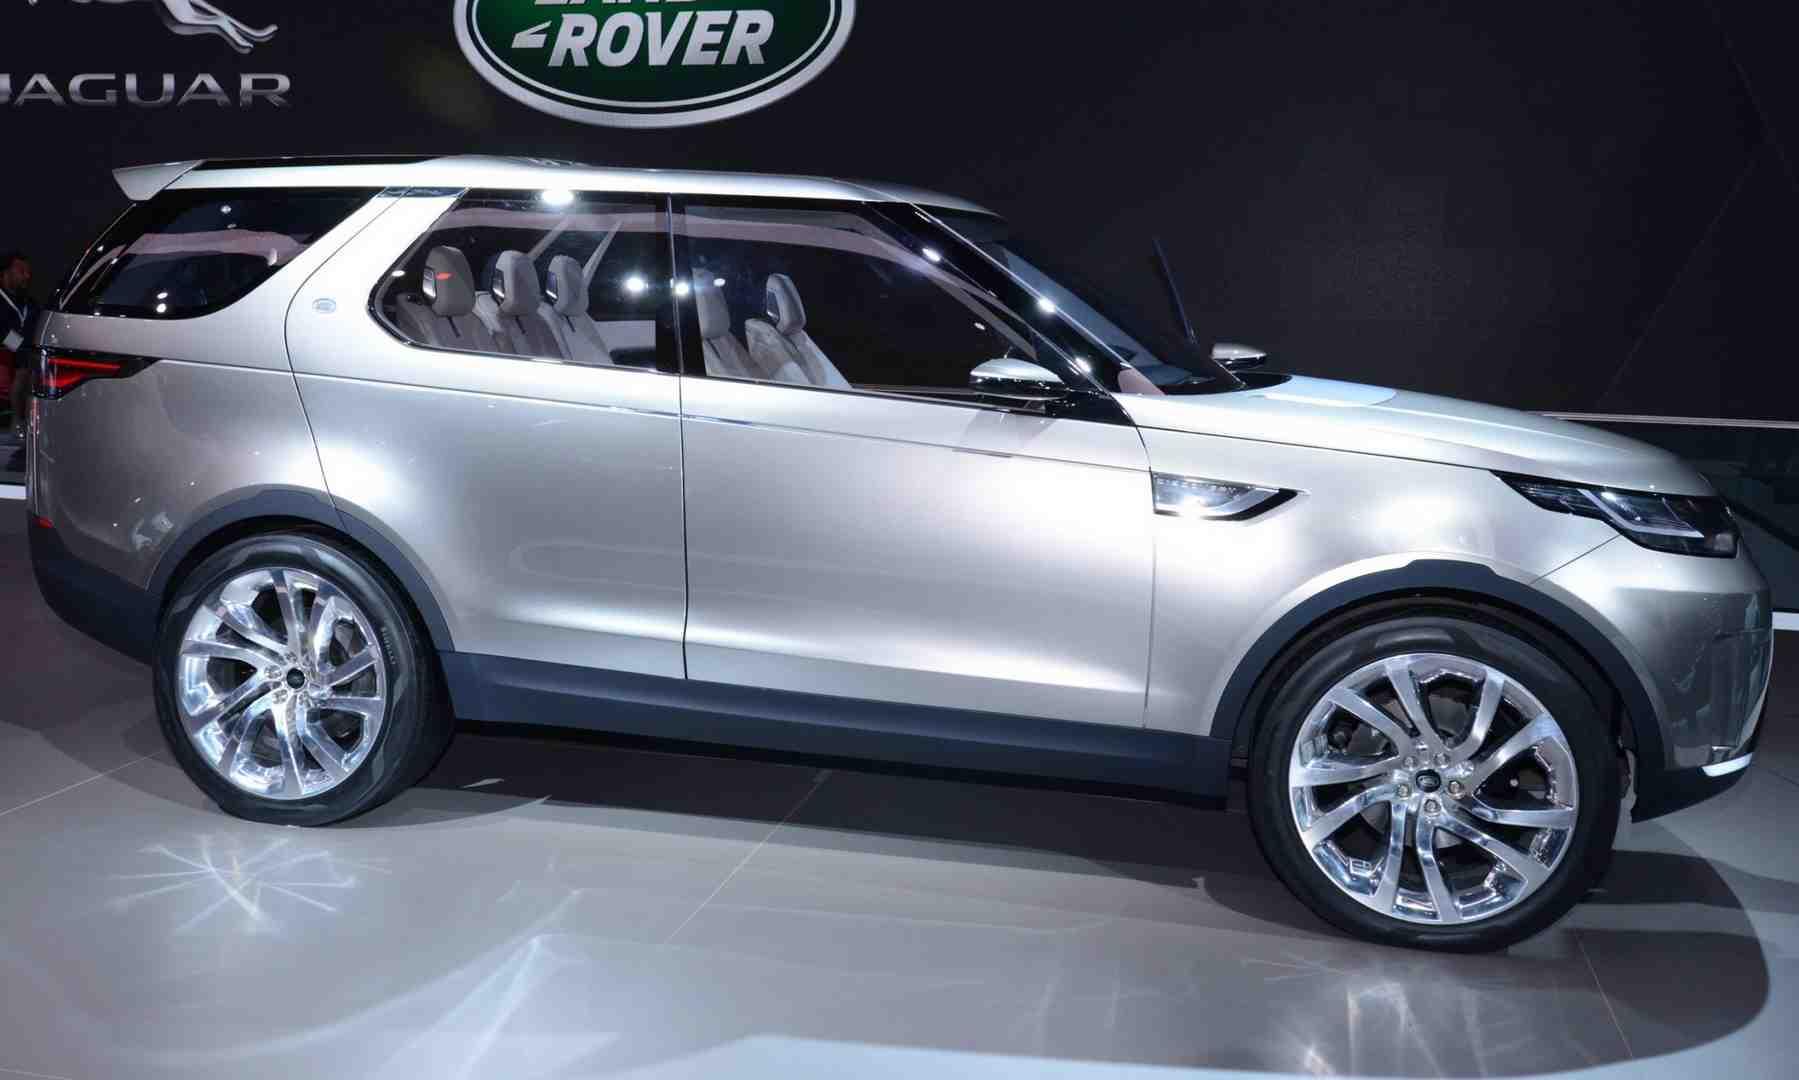 2016 Ford Explorer HD Desktop Image CarsWallpaperNet 1799x1080